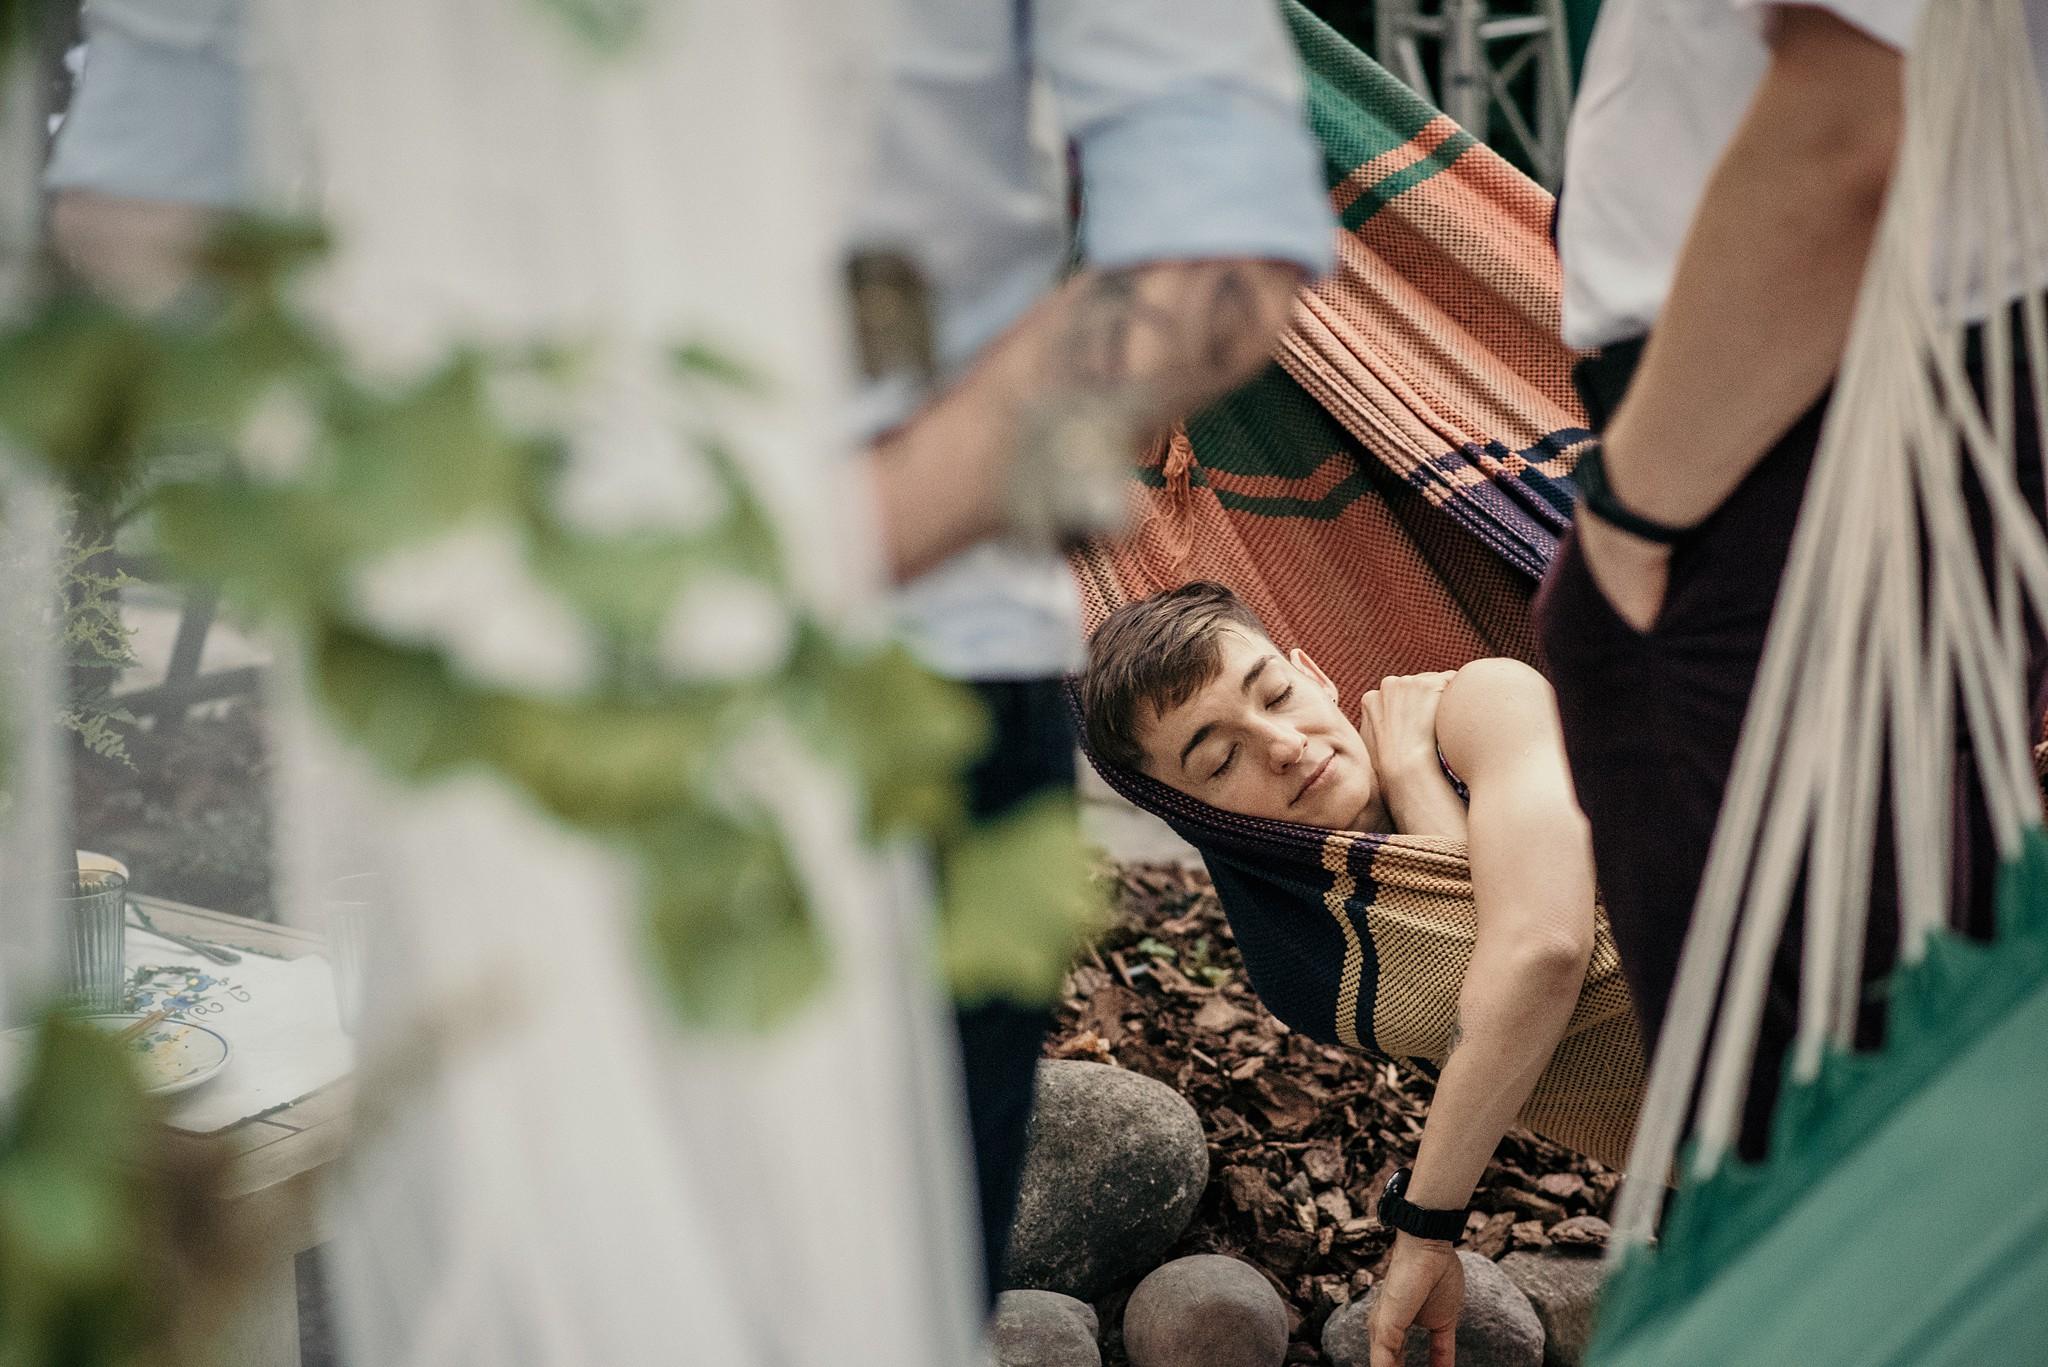 plenerowe wesele w stylu boho